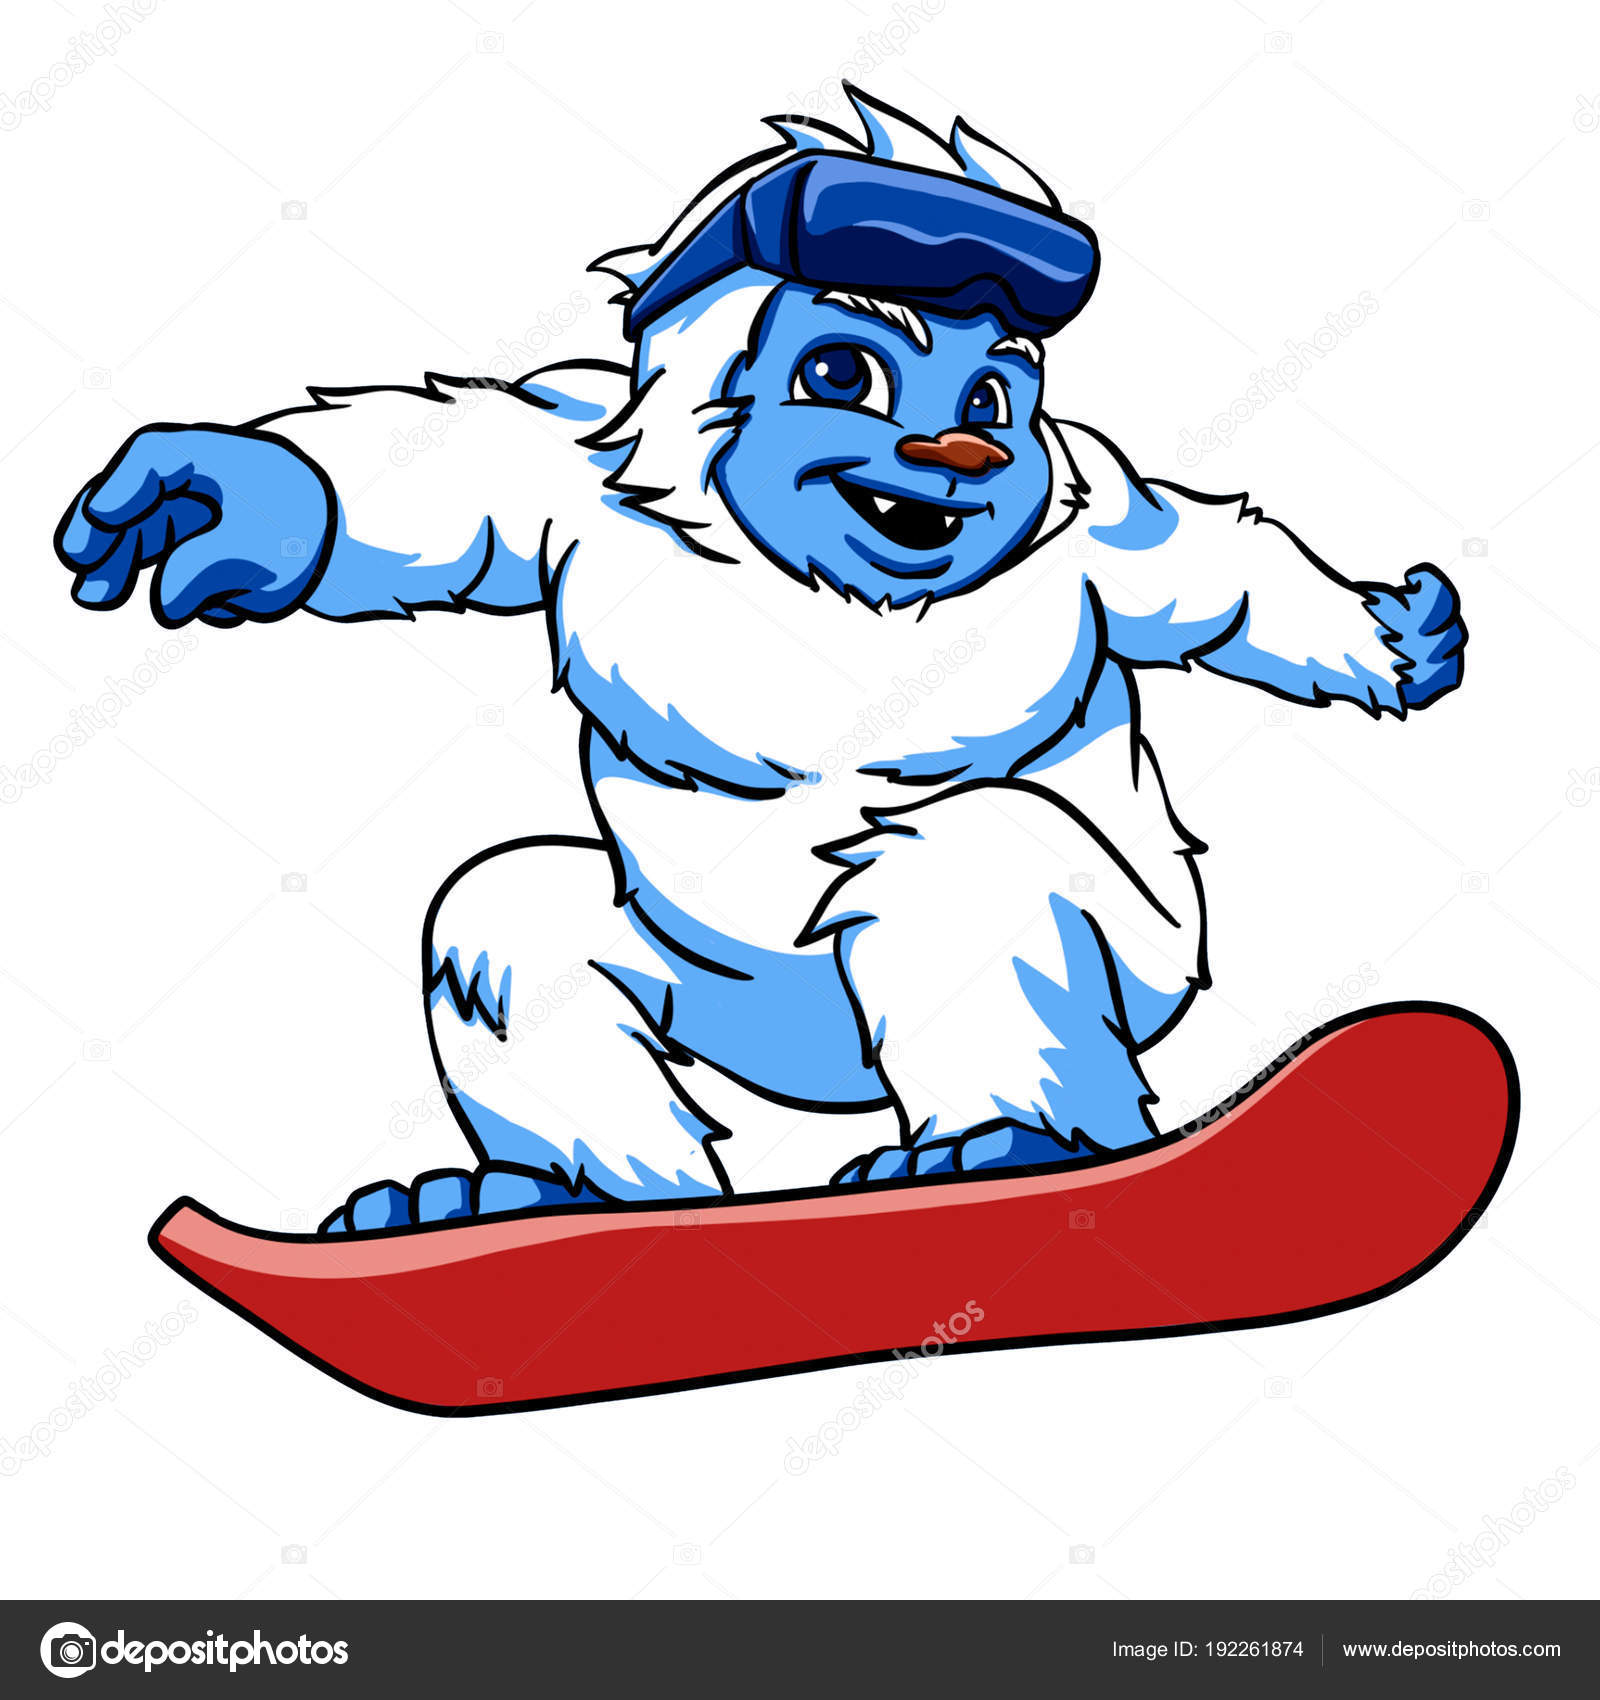 Pictures Snowboarding Cartoon Snowboarding Yeti Cartoon Illustration Stock Photo C Milesthone 192261874